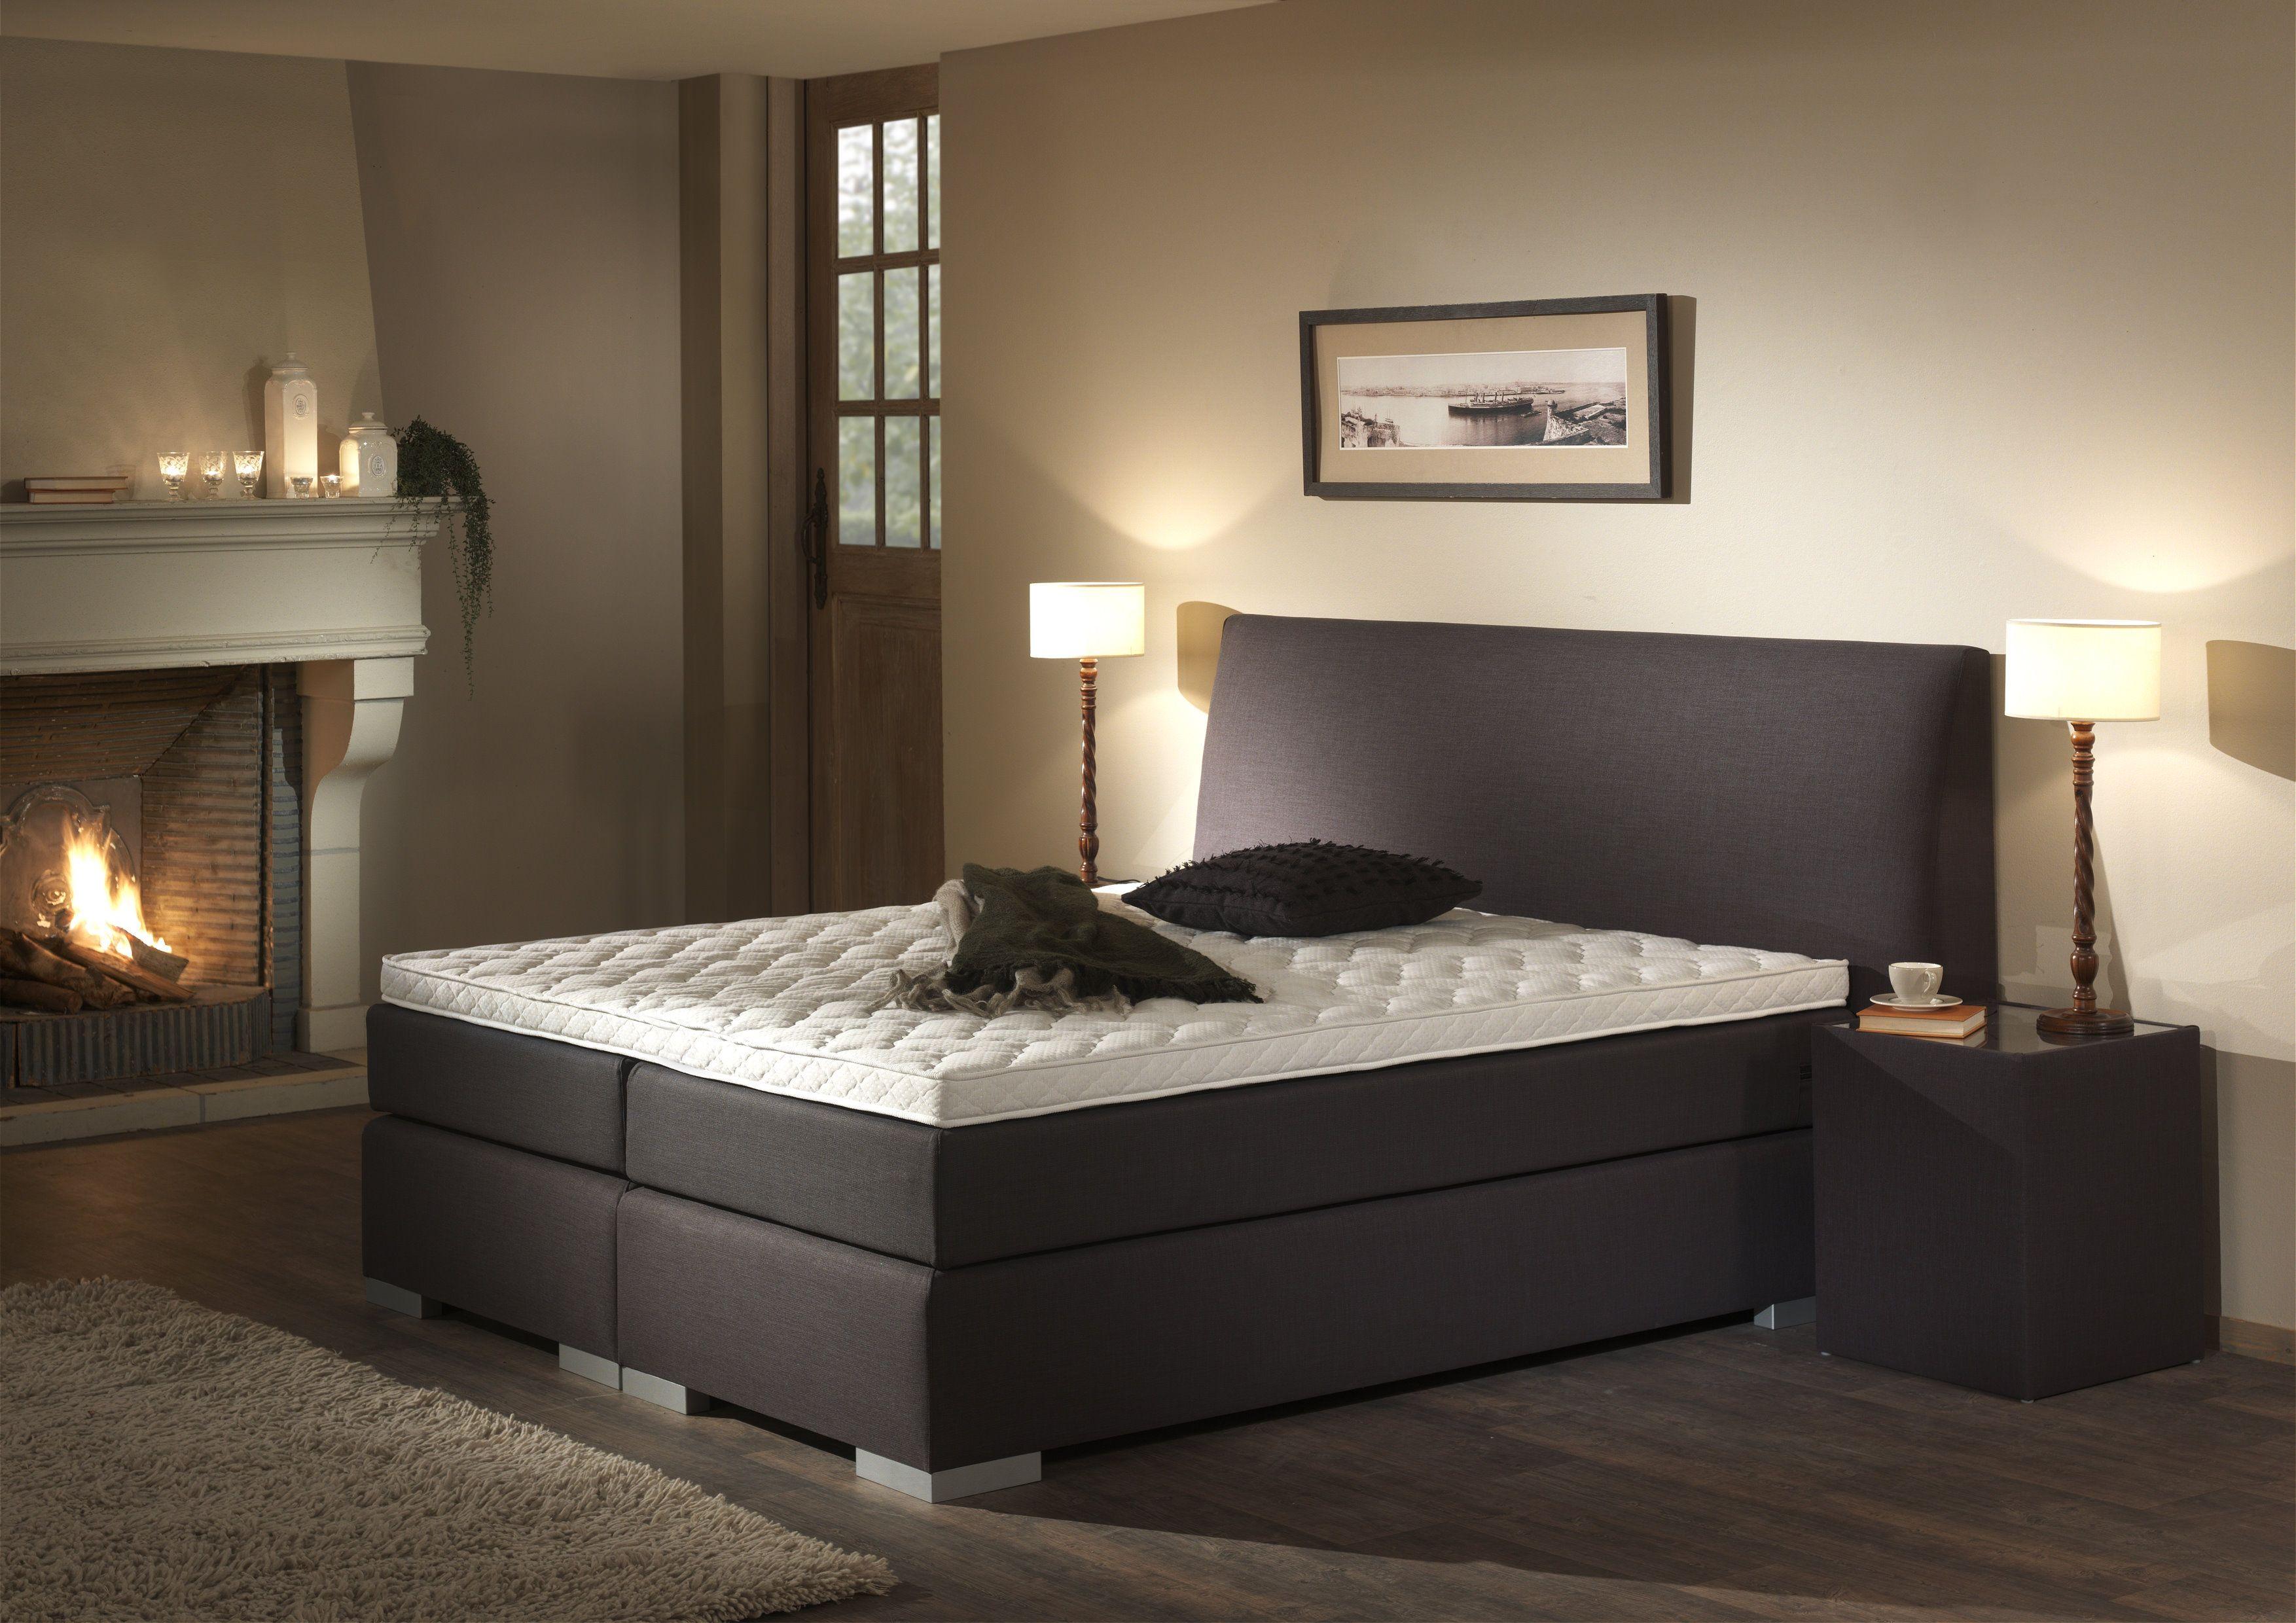 Boxspring Slaapkamer Set : Bedroom grey bed slaapkamer boxspring grijs bedroom